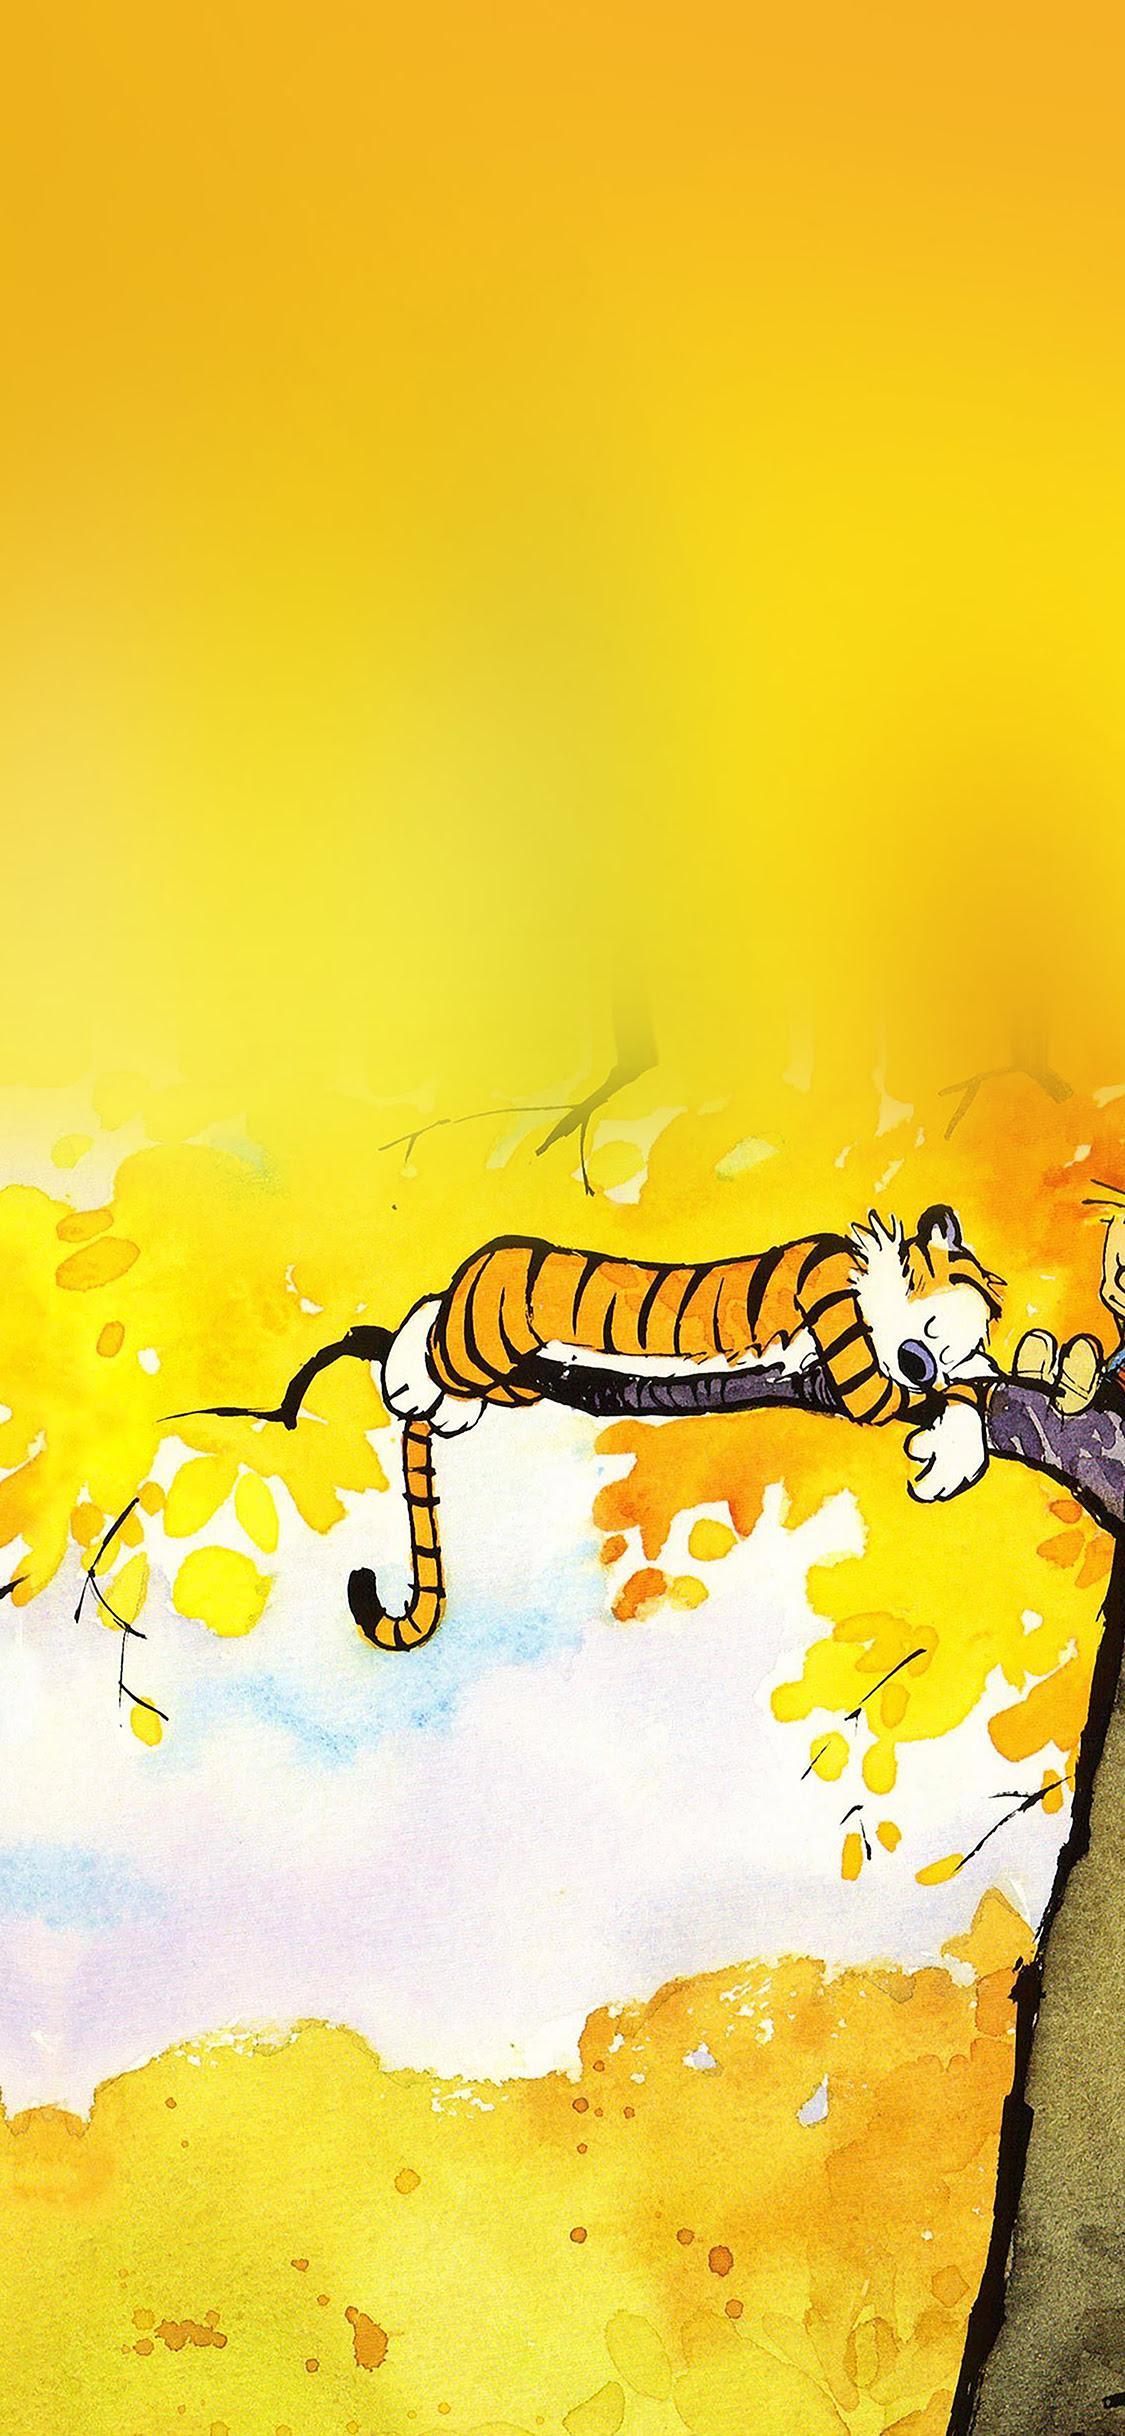 Ab20 Wallpaper Calvin And Hobbes Nap Illust